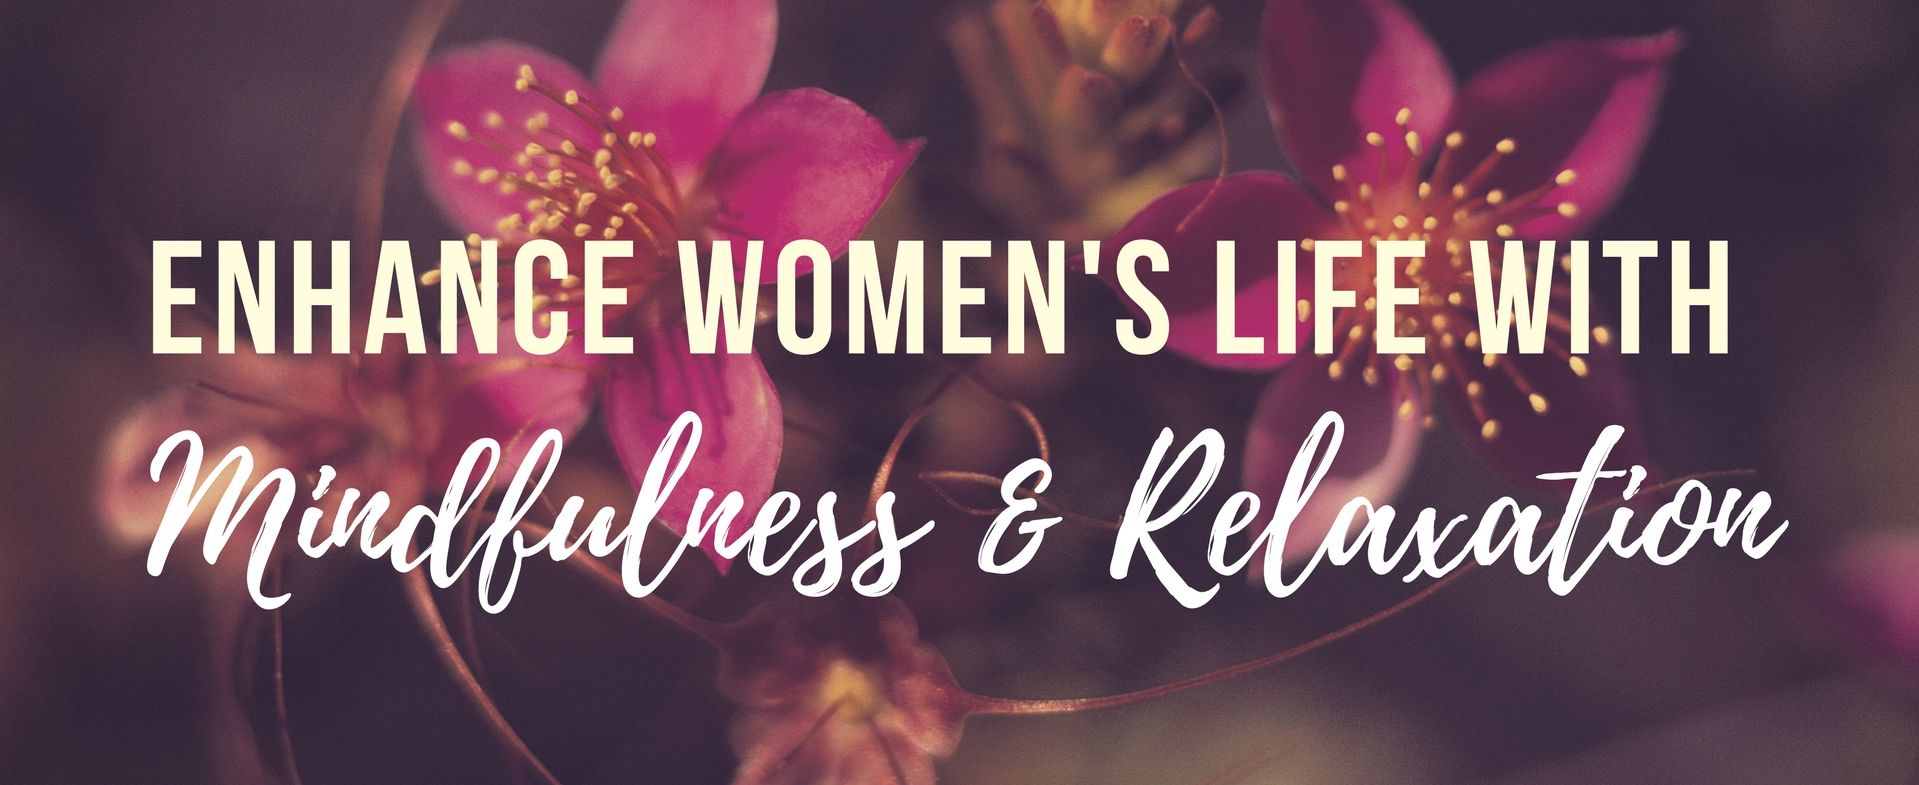 Pilates for Women's Health - Part 2